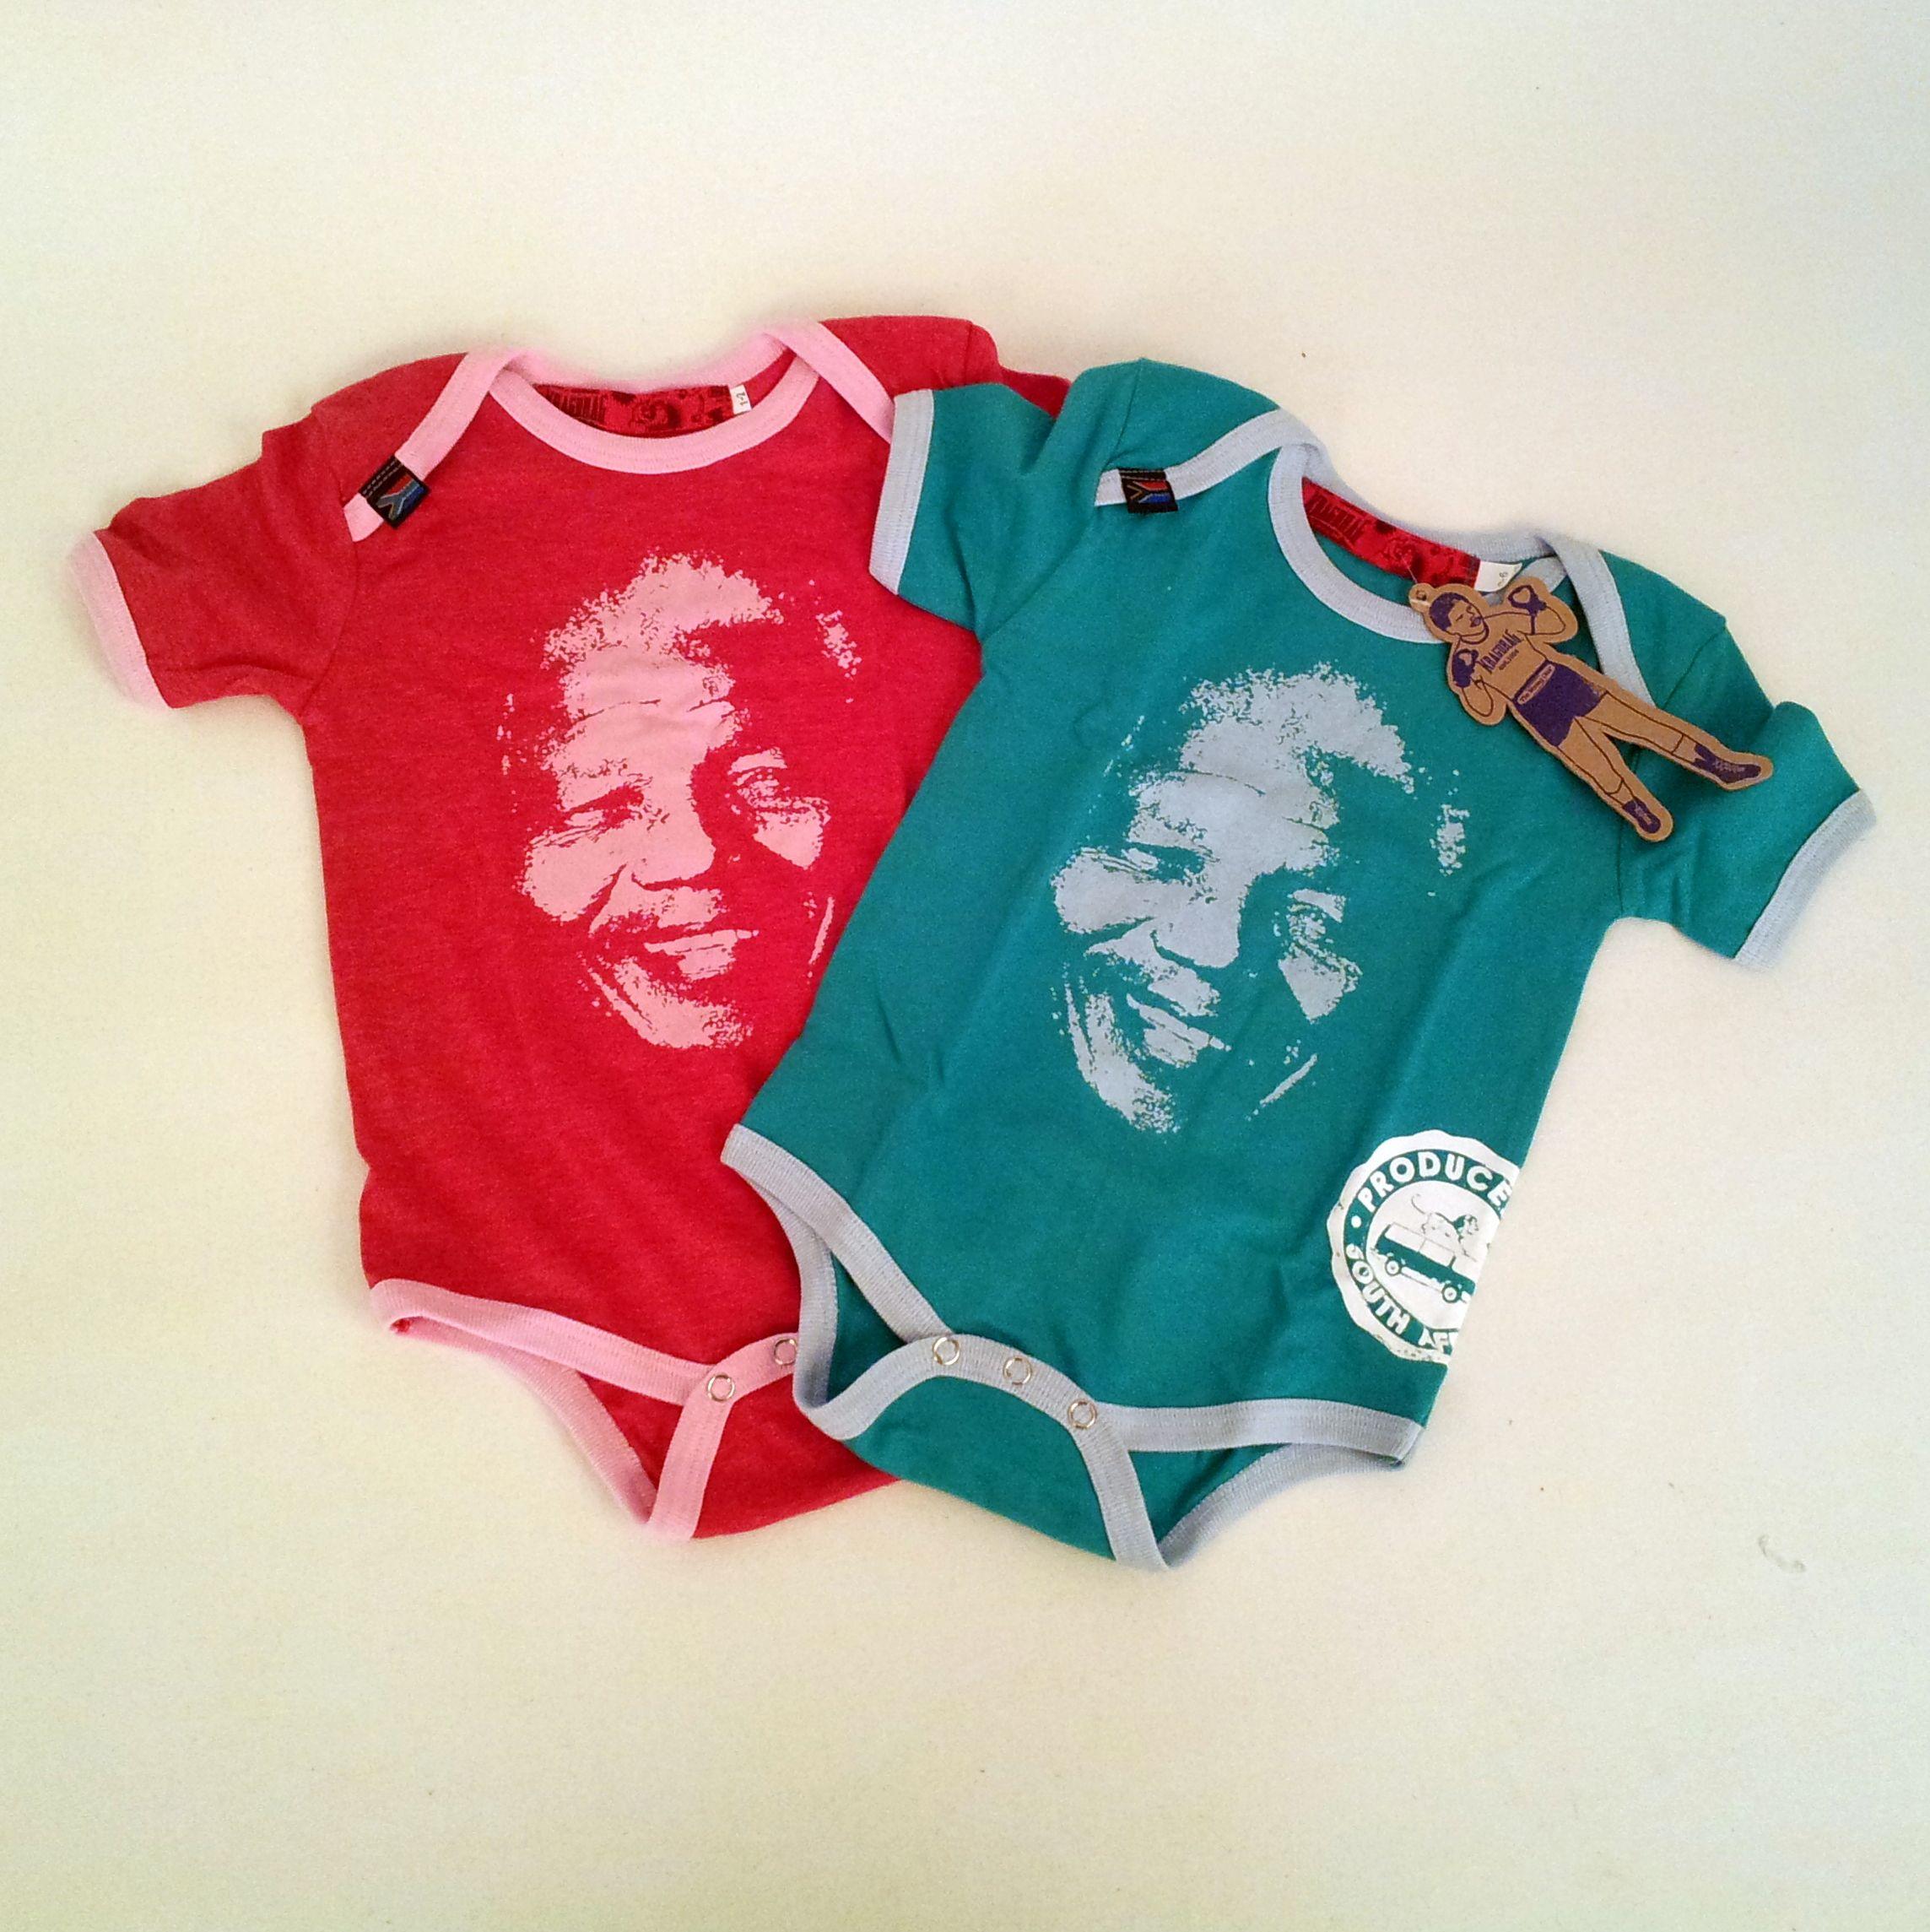 c99fe7a8f26a Bangalala Madiba Baby Grow R 195